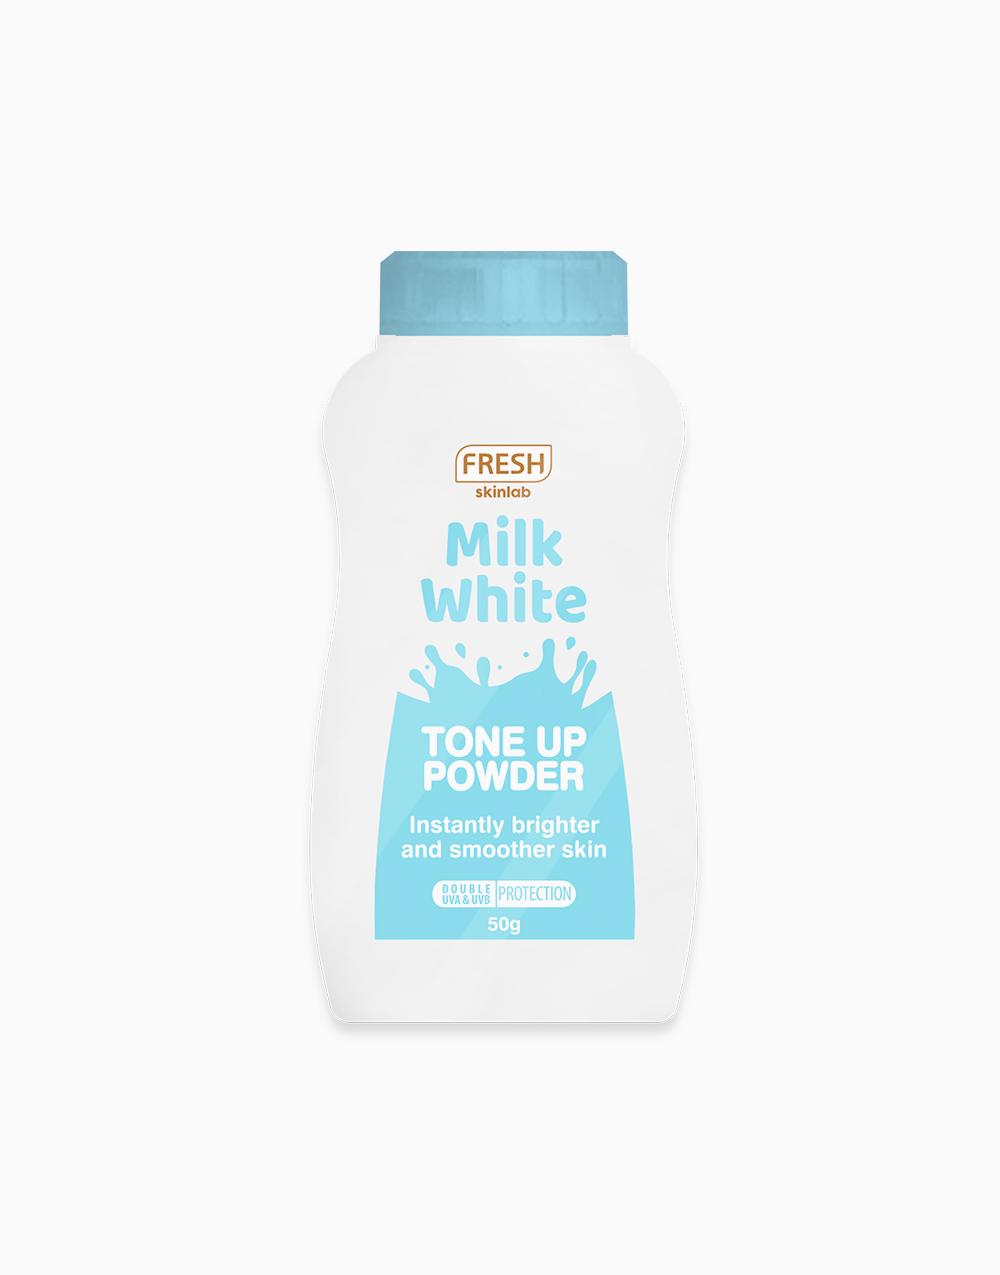 Fresh Skinlab Milk White Tone Up Powder (50g) by Fresh Philippines